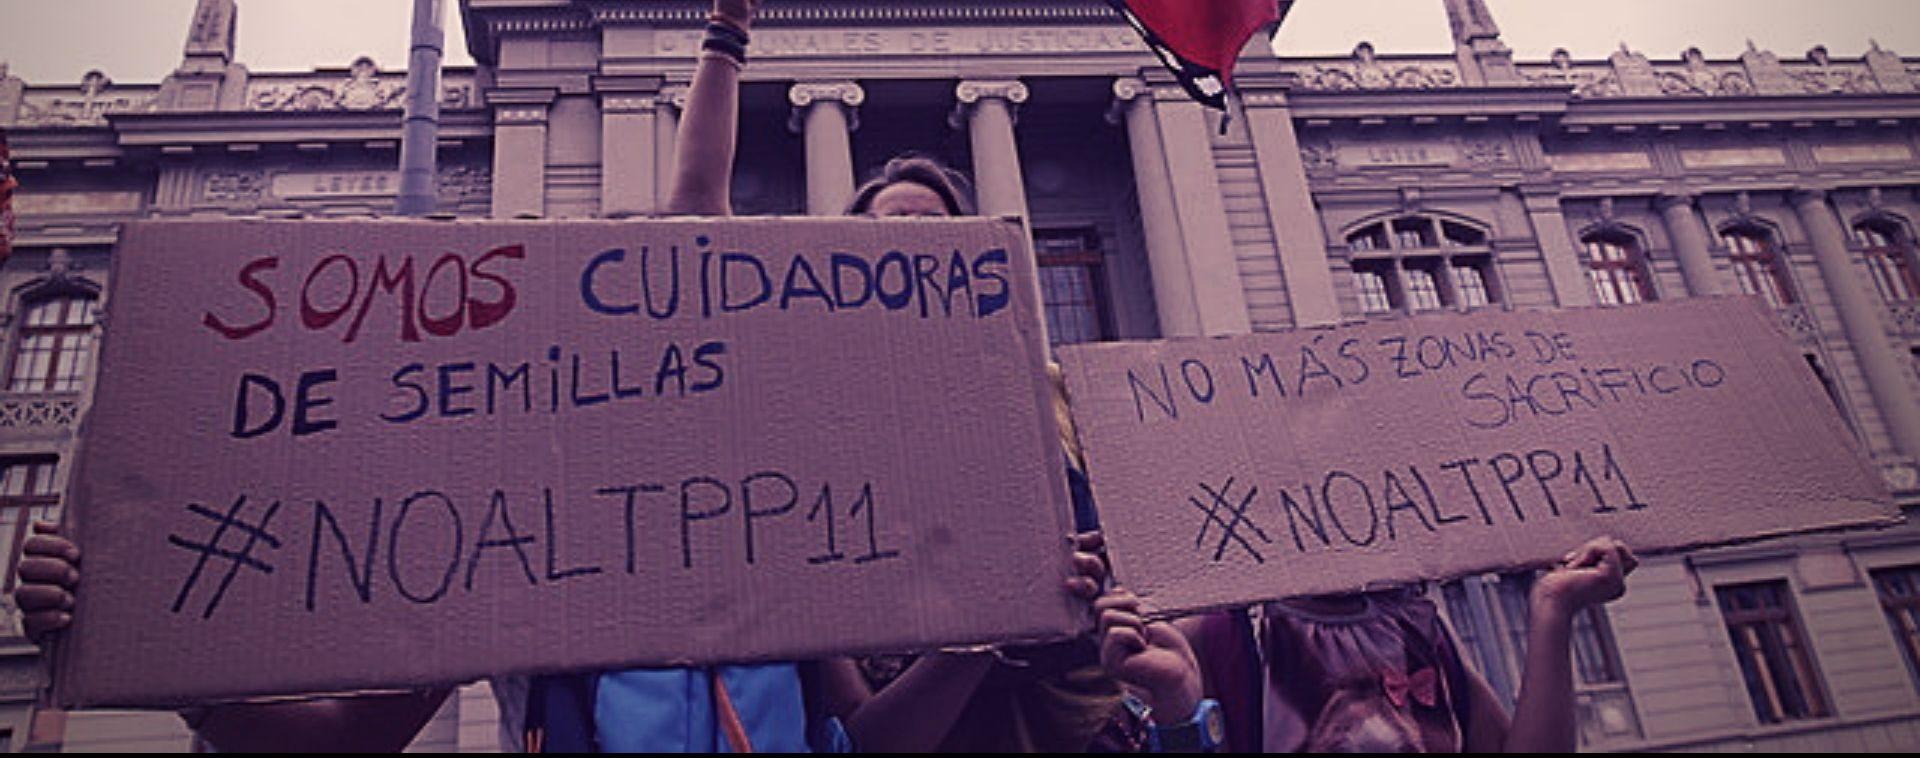 notpp tomate rojo agencia uno e1566789328117 183x96 - Piñera le pone suma urgencia al TPP 11 por cuarta vez y espera que se apruebe antes de fin de mes